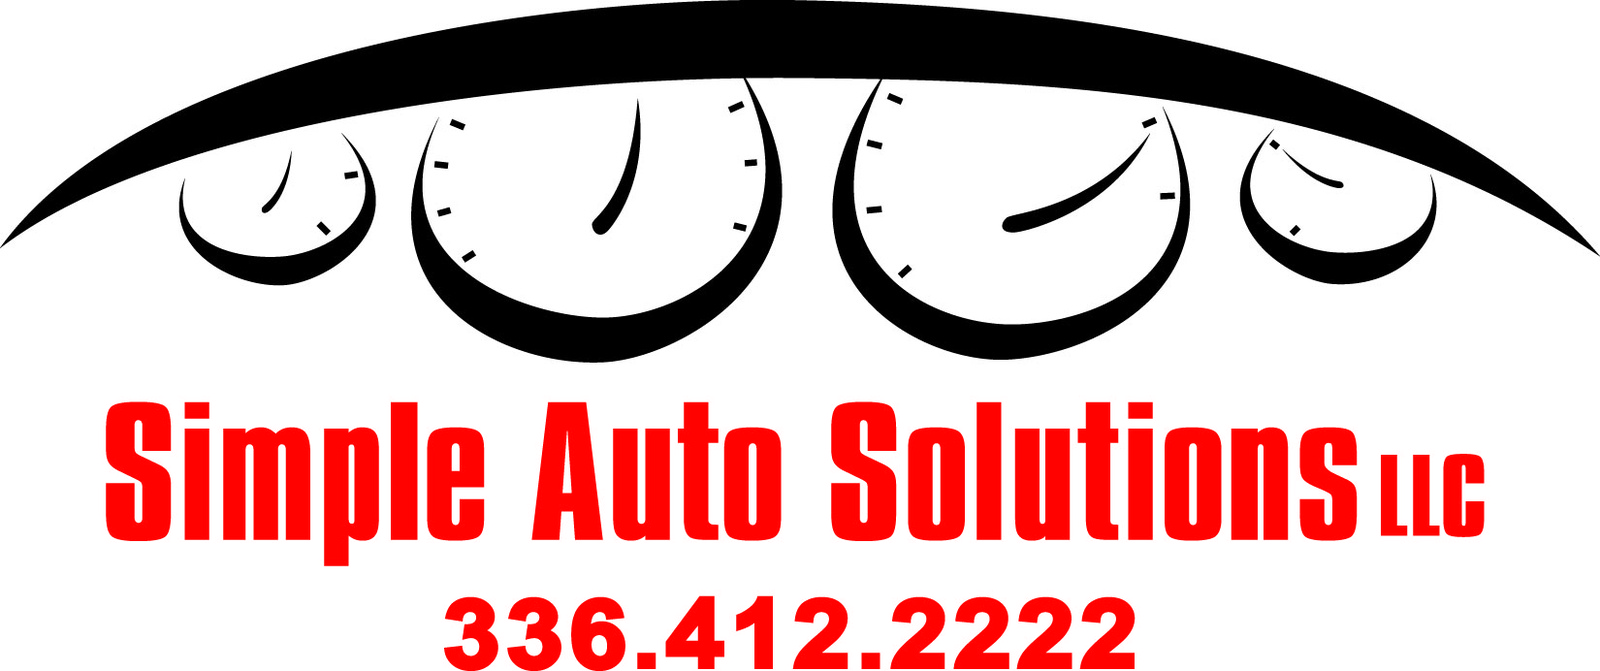 Simple Auto Solutions Llc Greensboro Nc Read Consumer